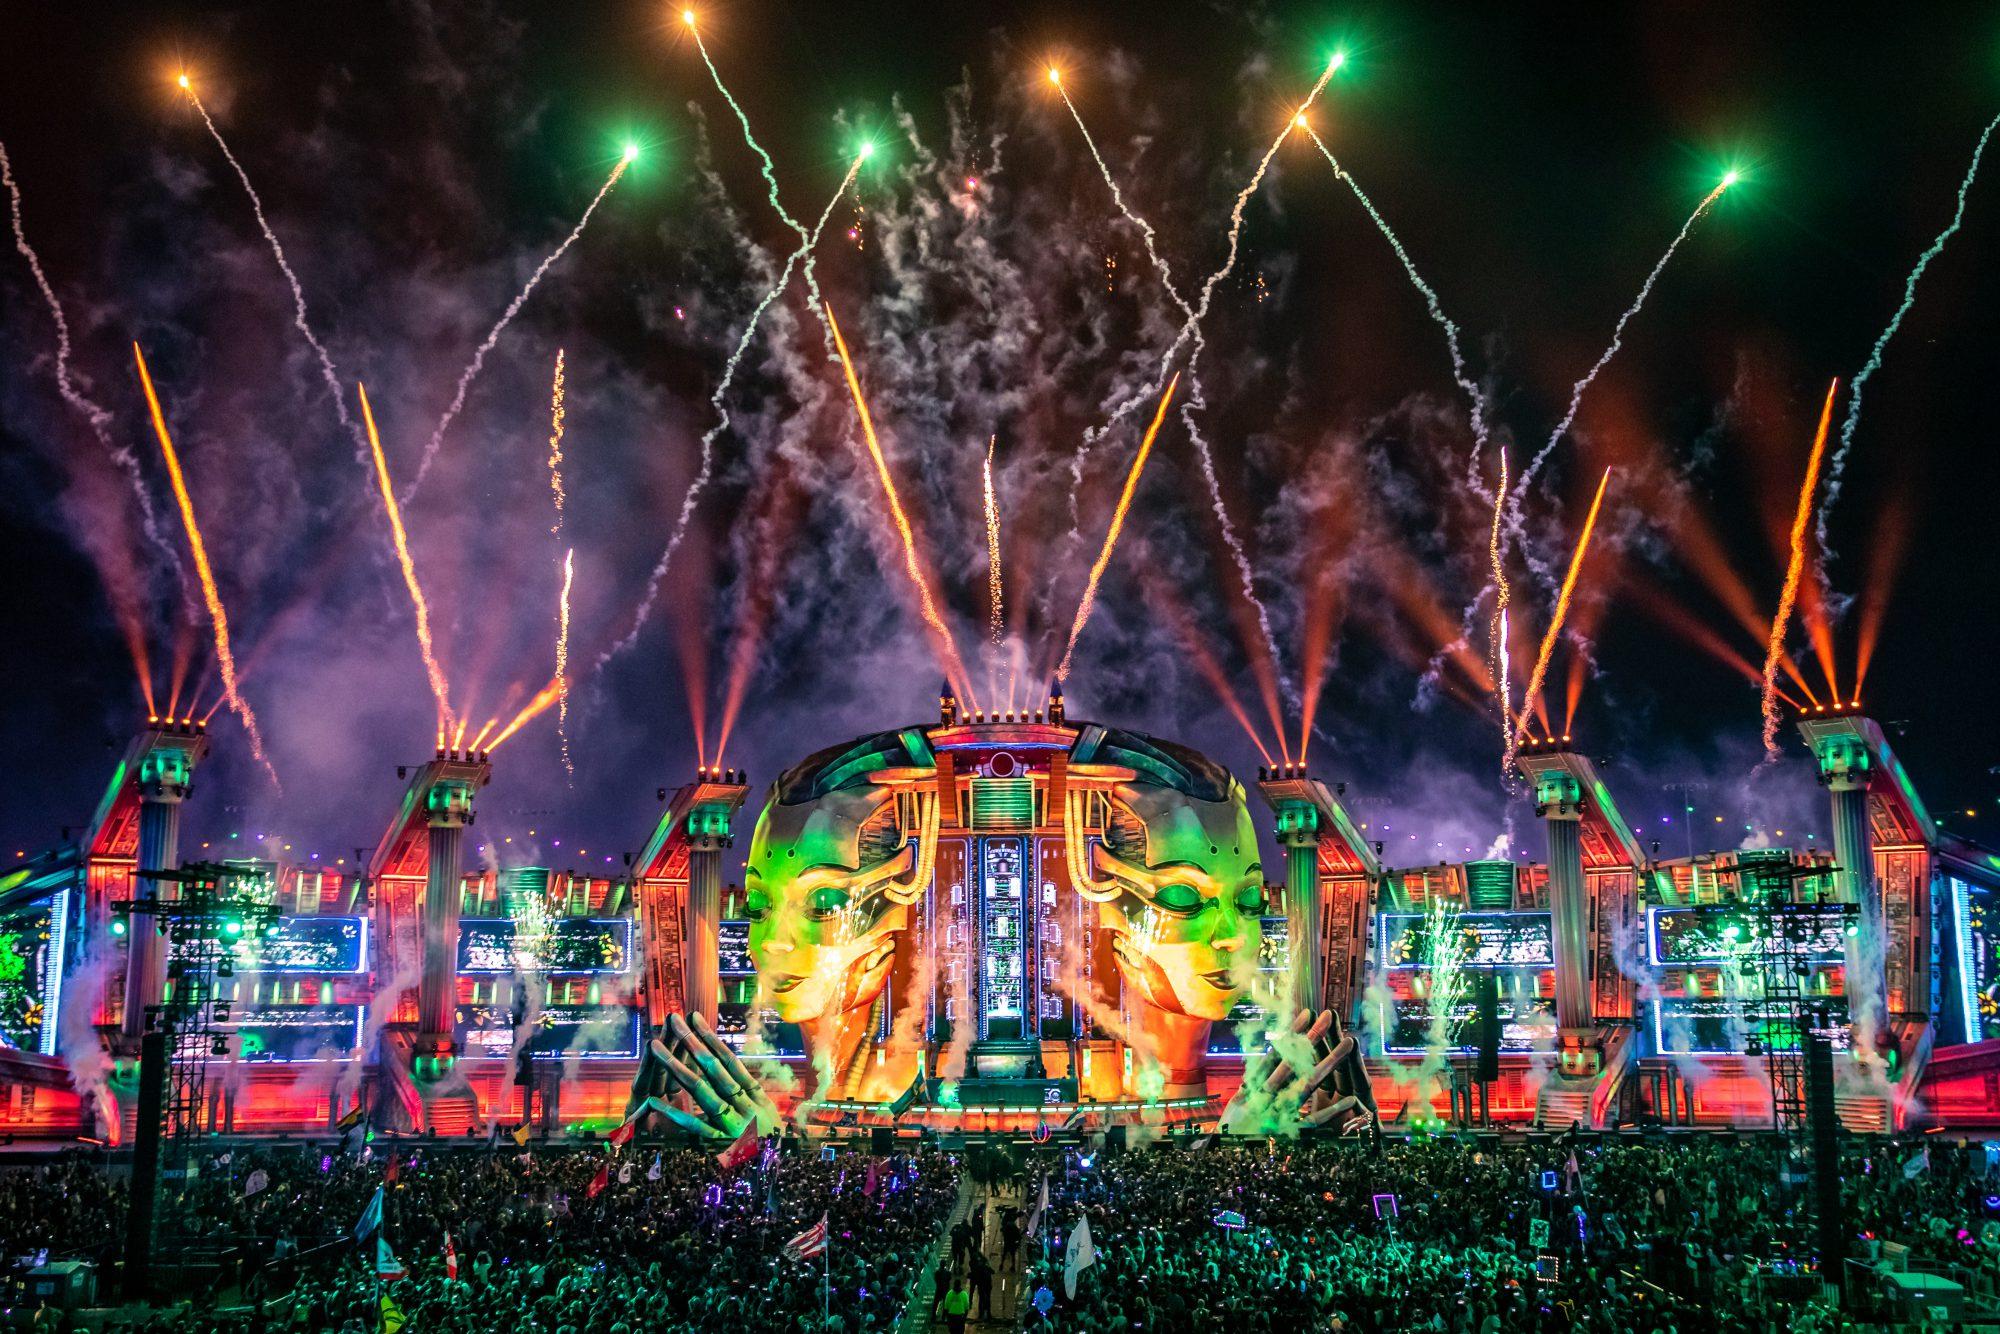 When We Were Young Festival 2020 Insomniac Announces Dates for EDC Las Vegas 2020 | EDM Identity